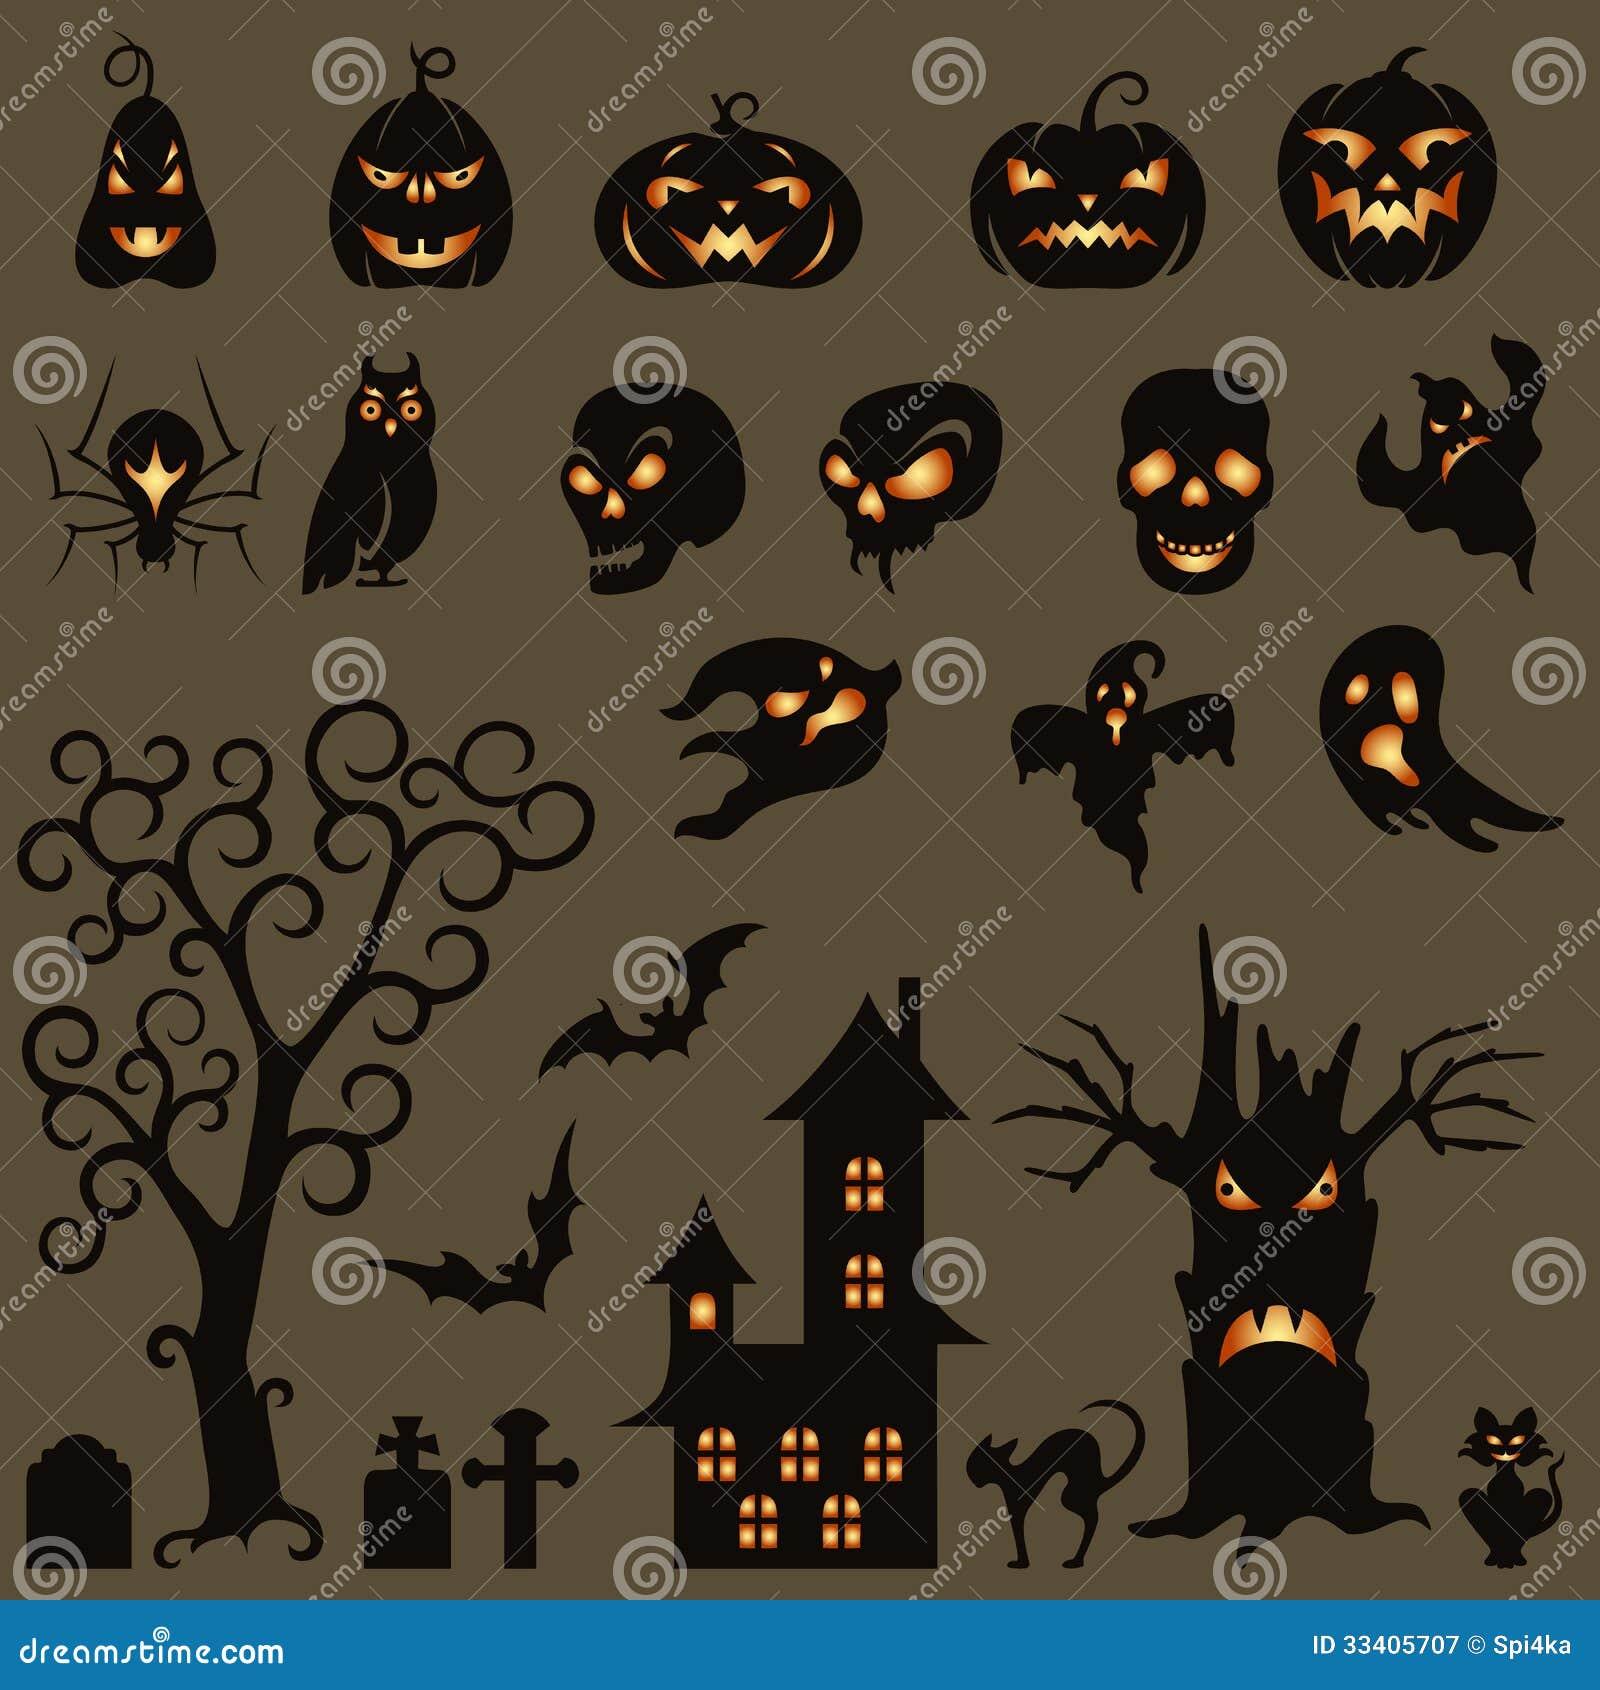 set of halloween design elements royalty free stock photography - Design Halloween